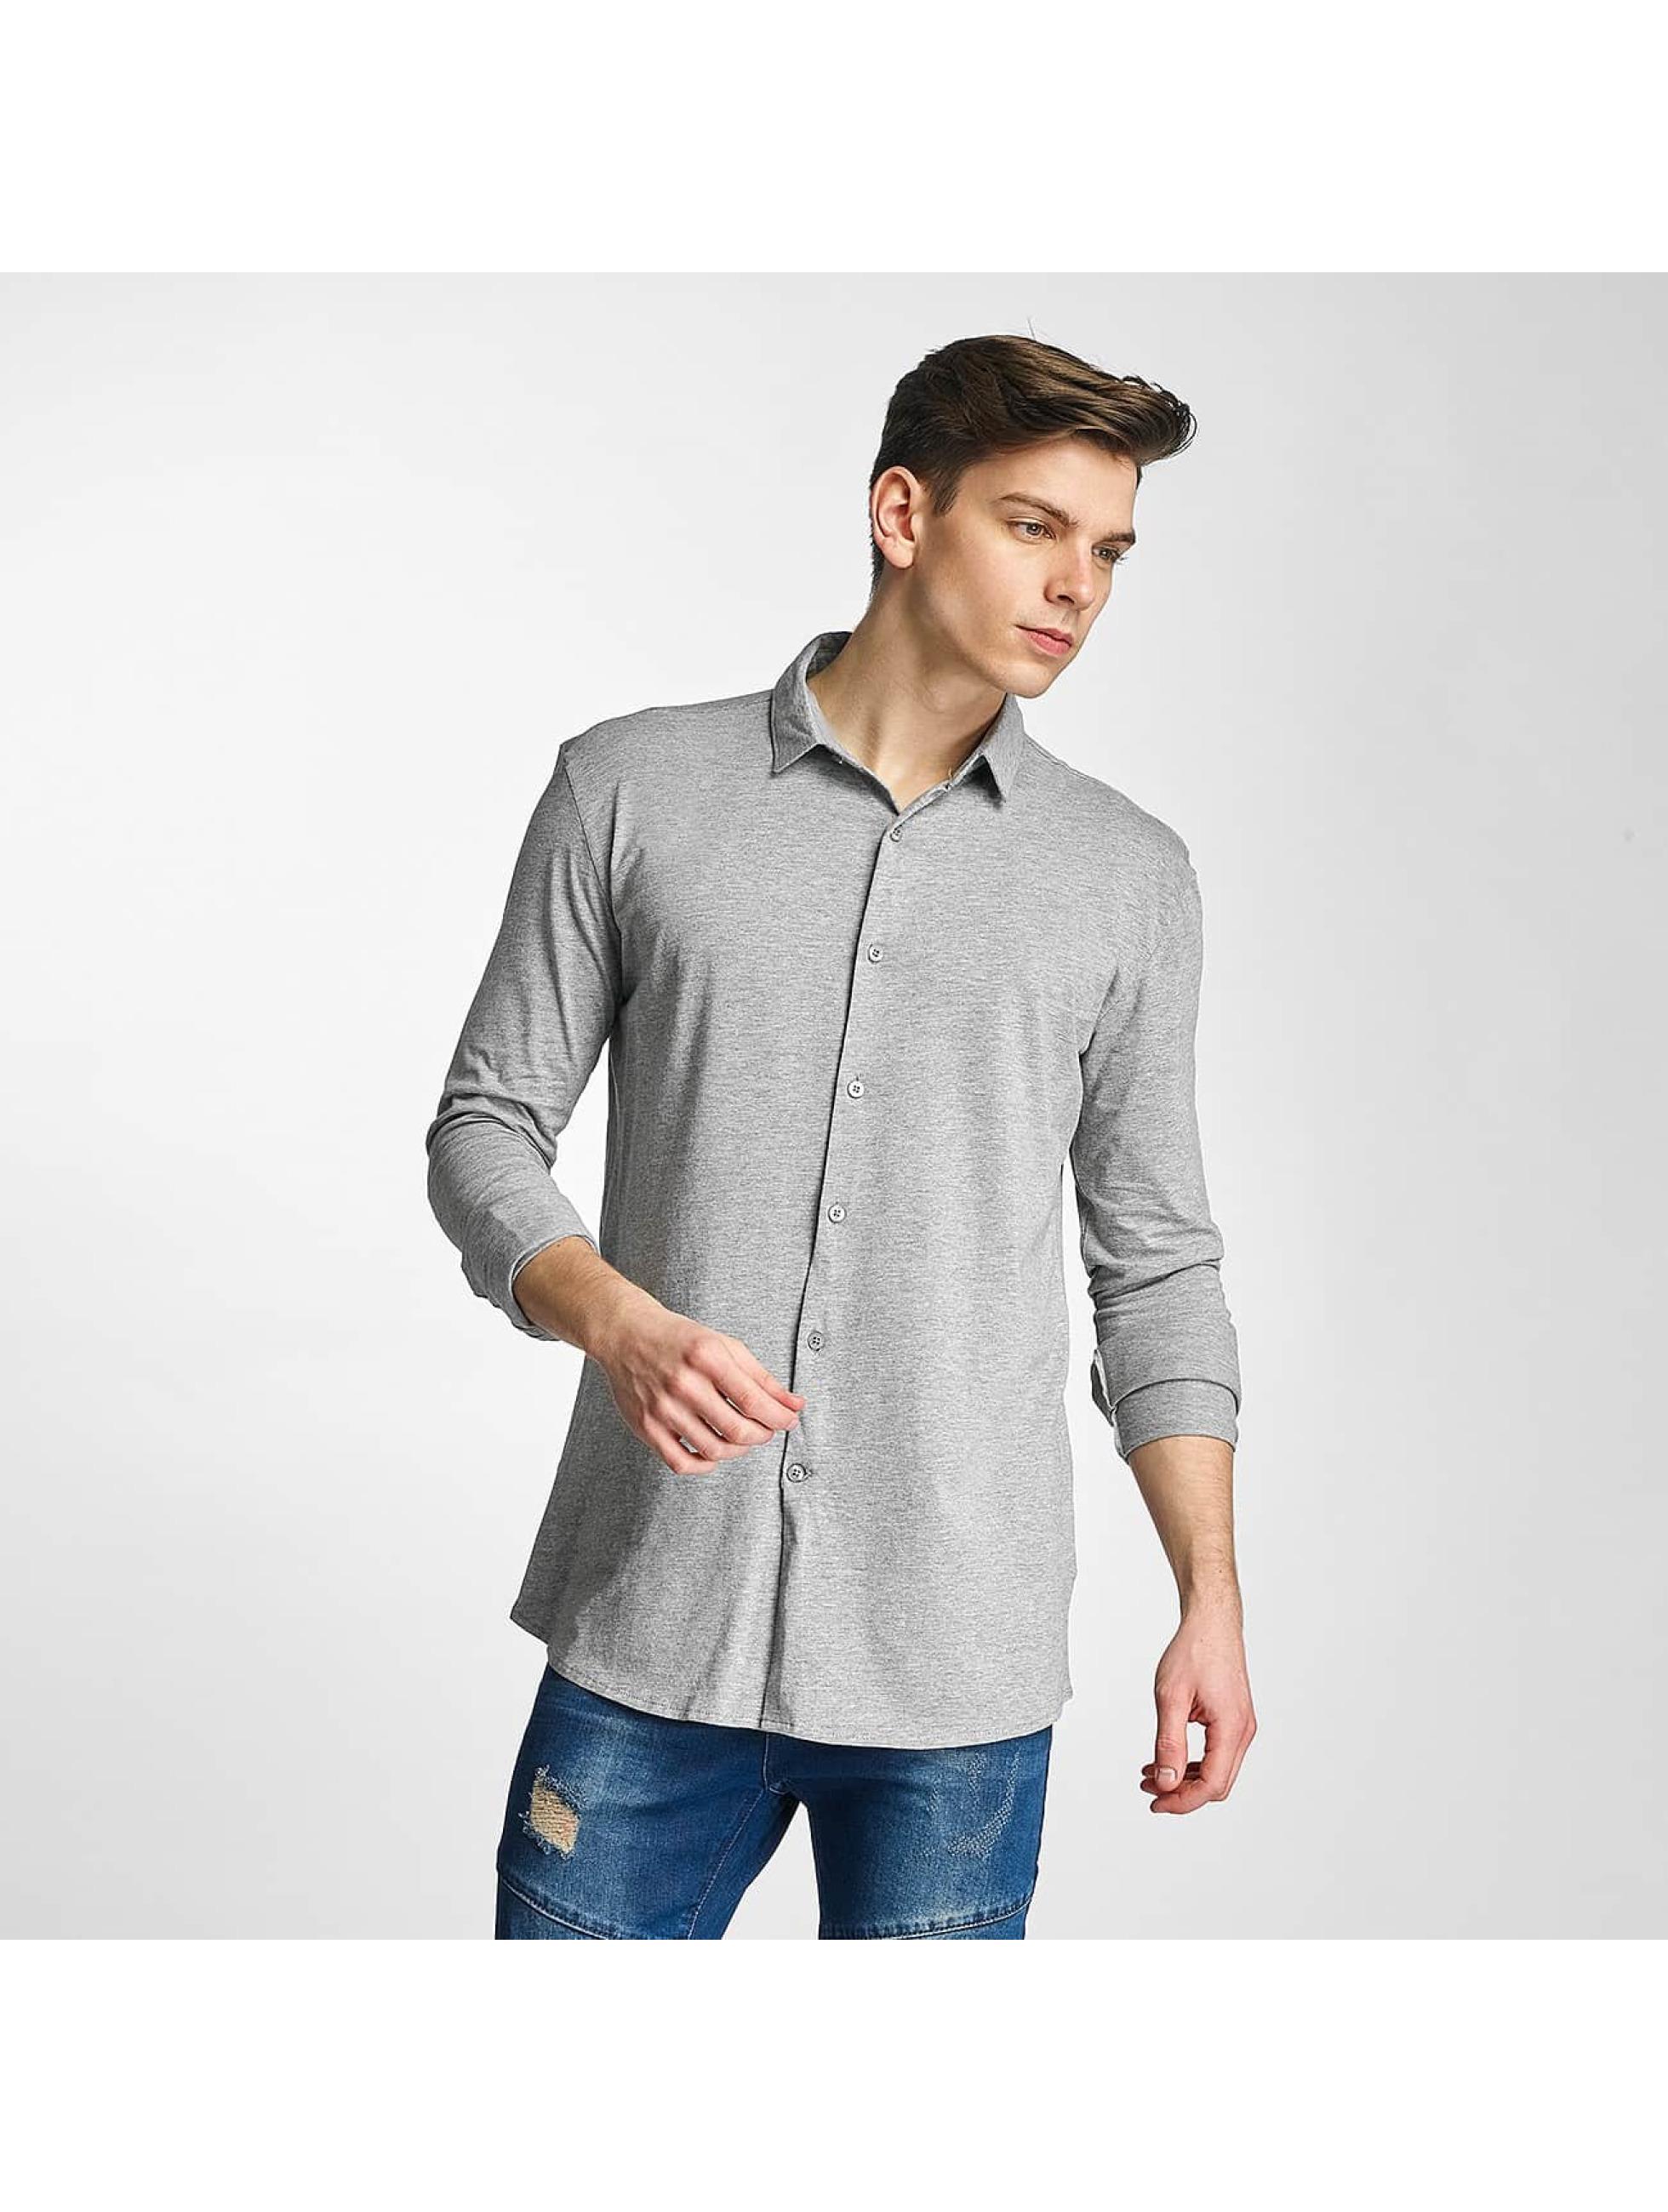 Lindbergh Shirt Jersey grey